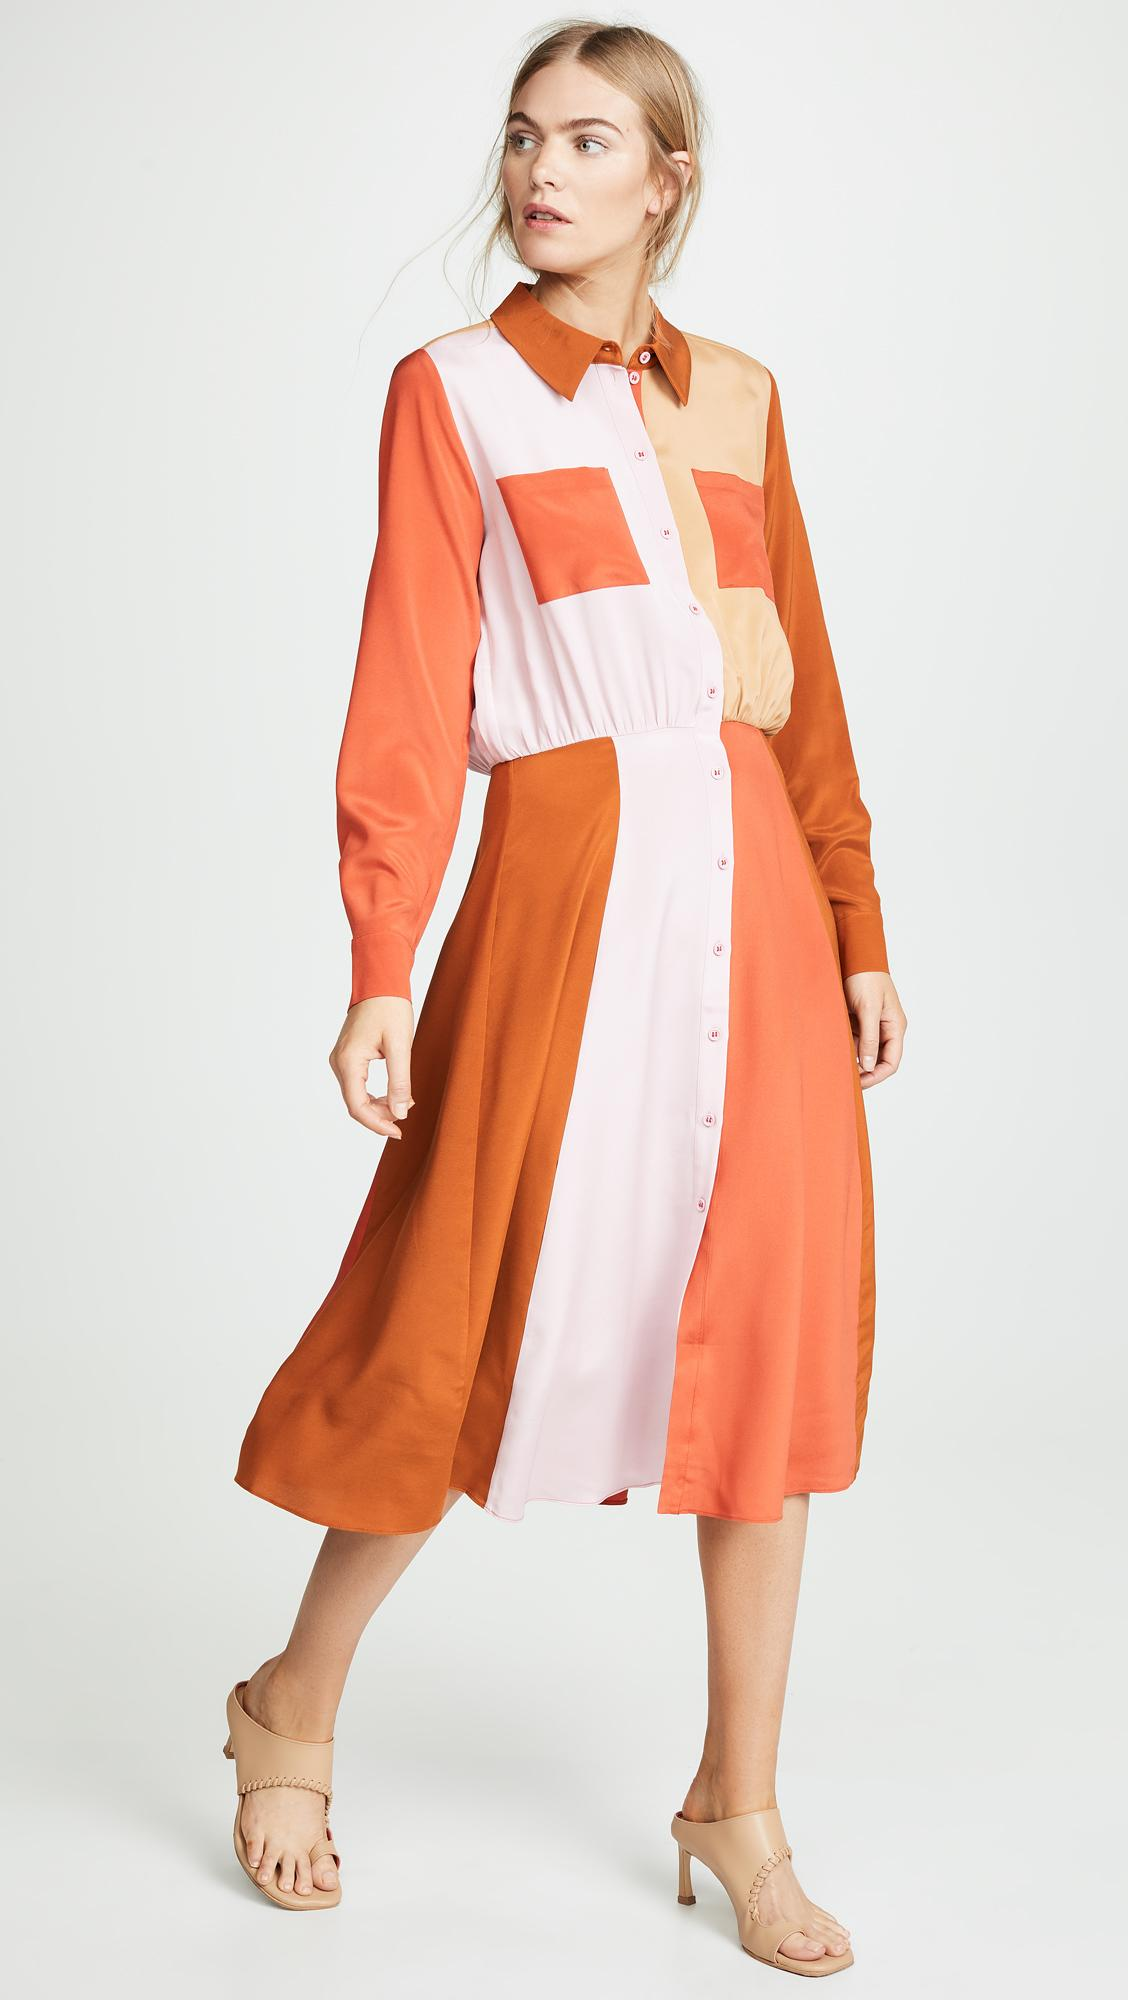 9277f7777 Stine Goya Renee Dress in Orange - Lyst